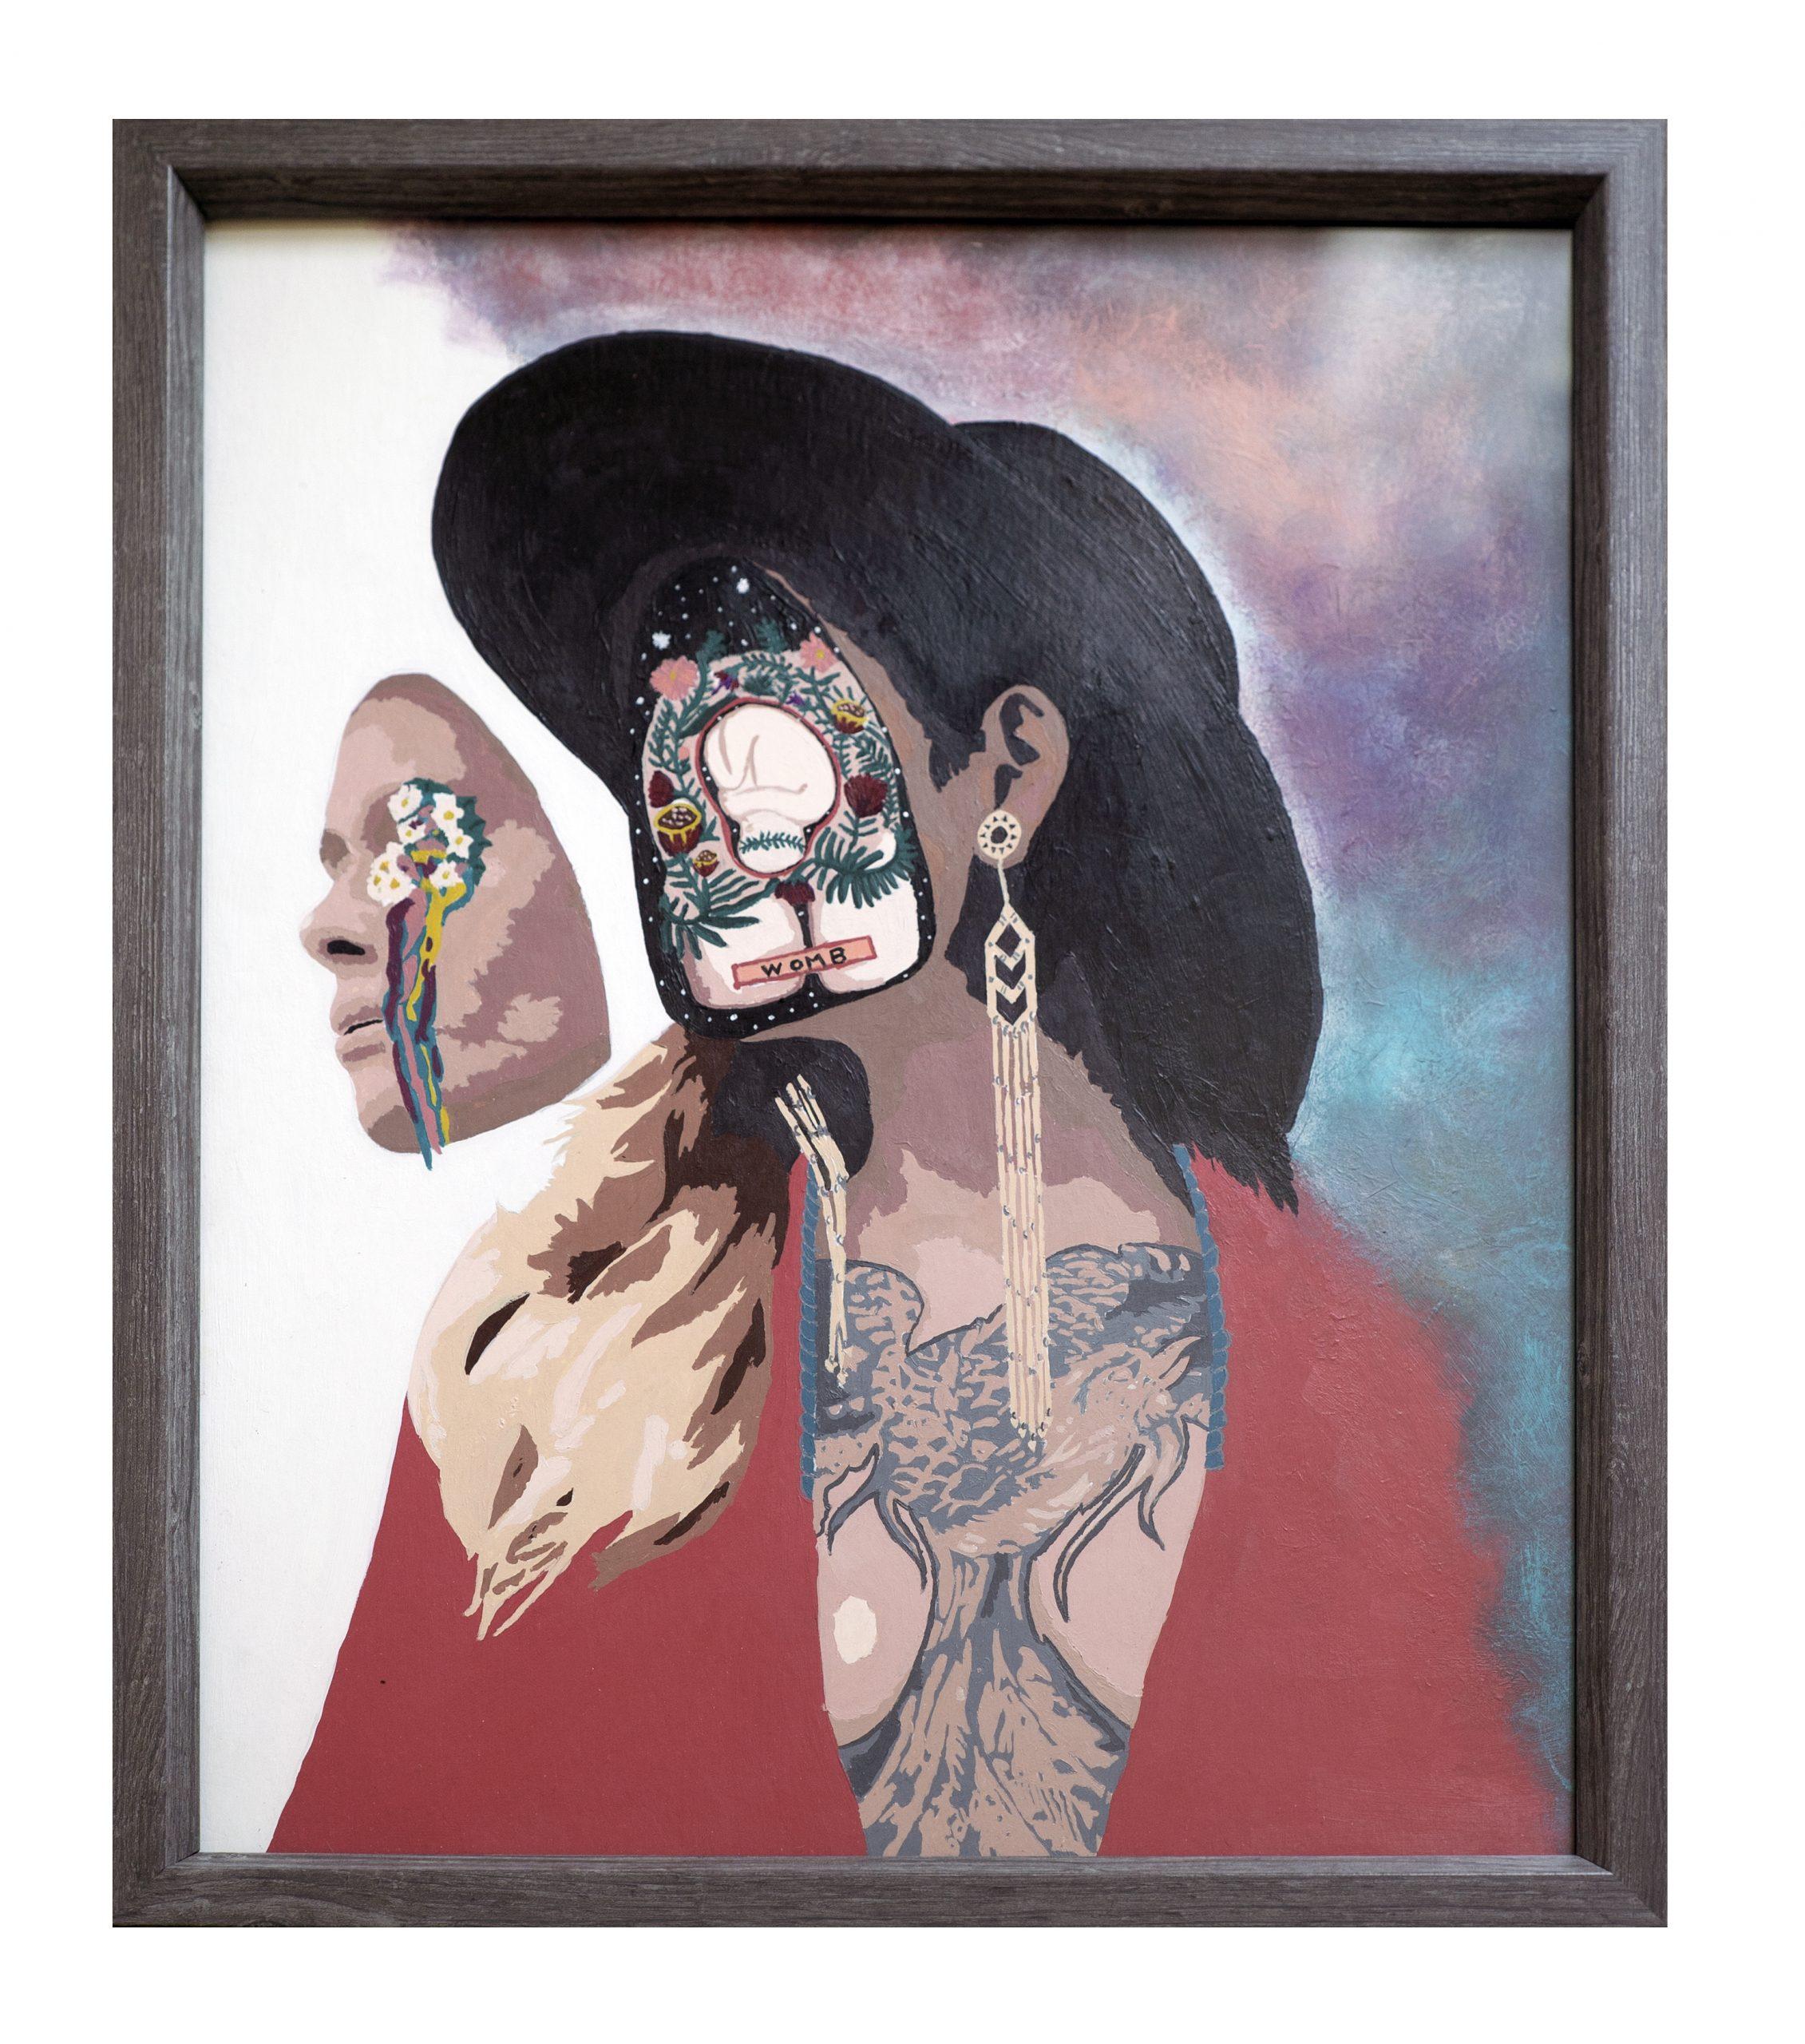 "Jaq Schmitz; Maternal Generational Trauma and Healing, 2020; Acrylic Paint on Poster Board; 20 x 16""; Painting"